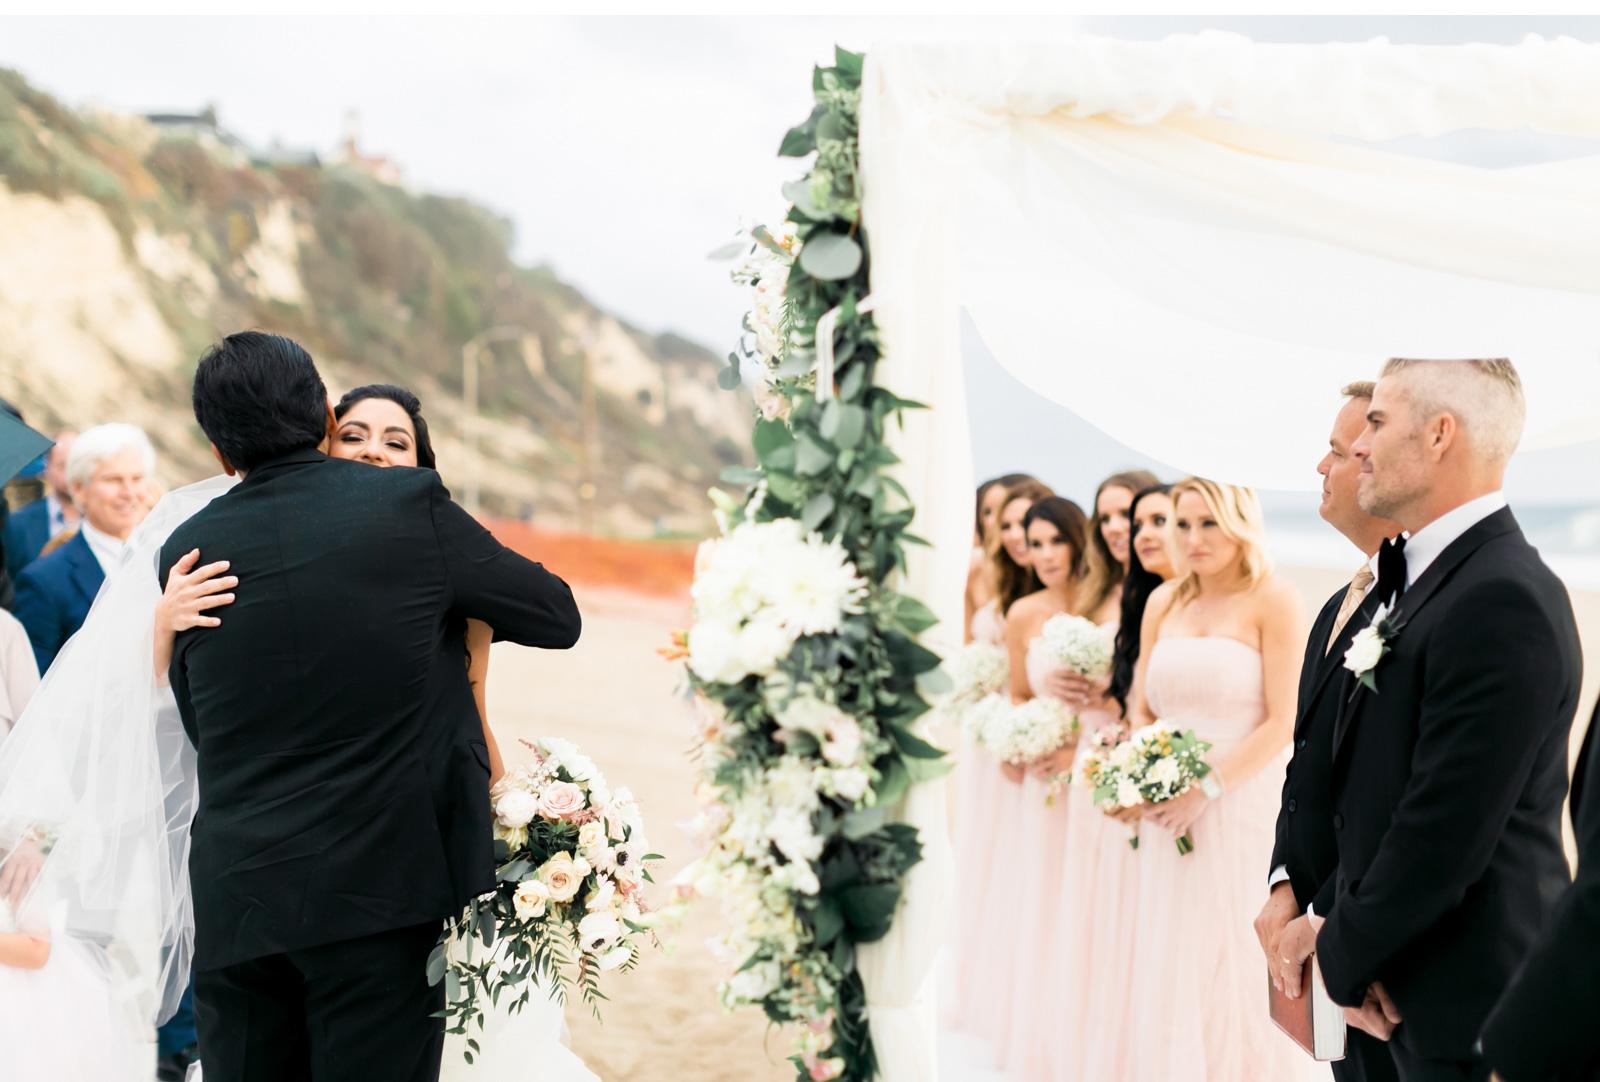 Malibu-Wedding-Natalie-Schutt-Photography-Style-Me-Pretty_08.jpg